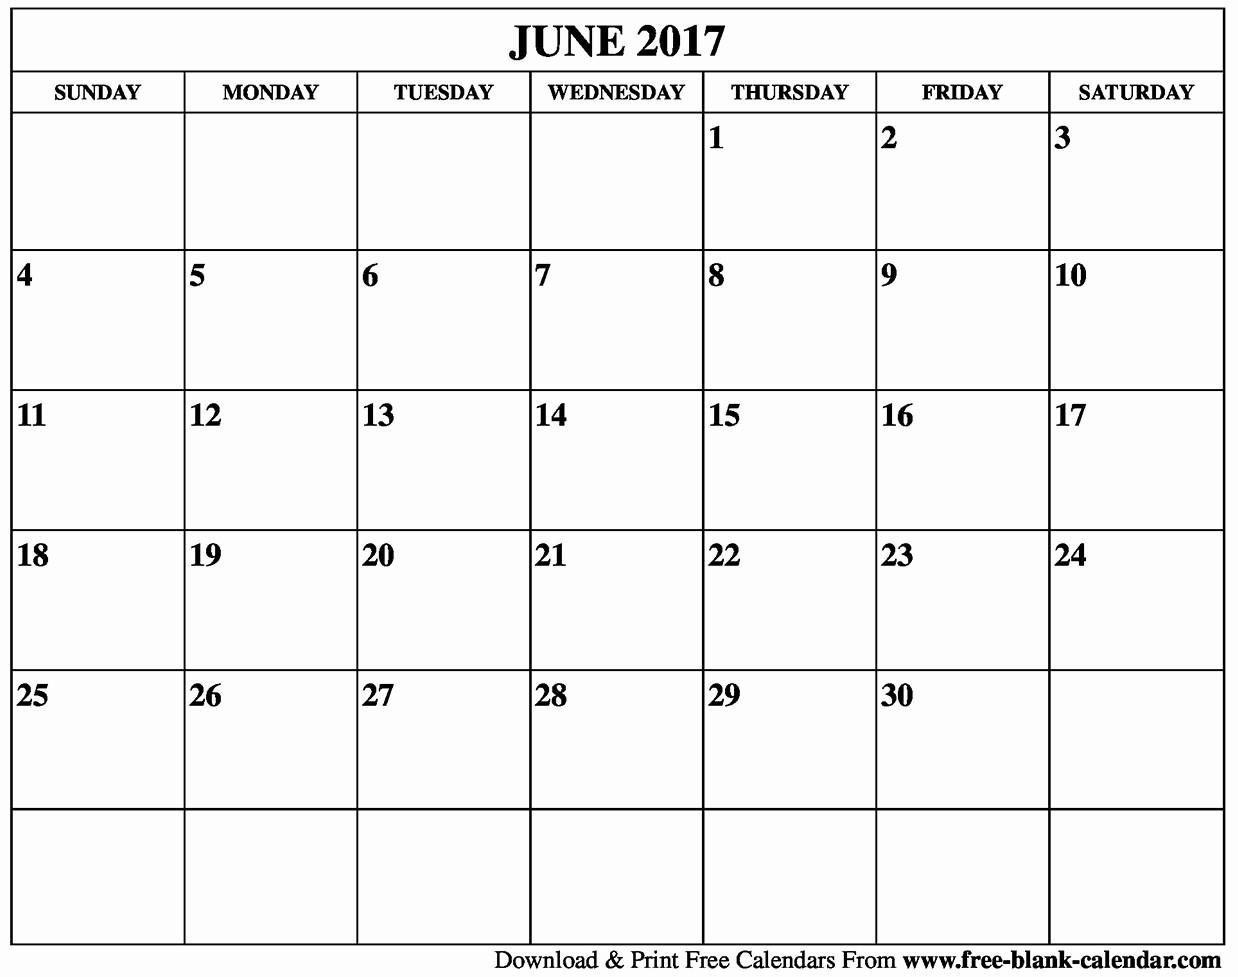 Free Blank Printable Calendar 2017 Fresh Blank June 2017 Calendar Printable